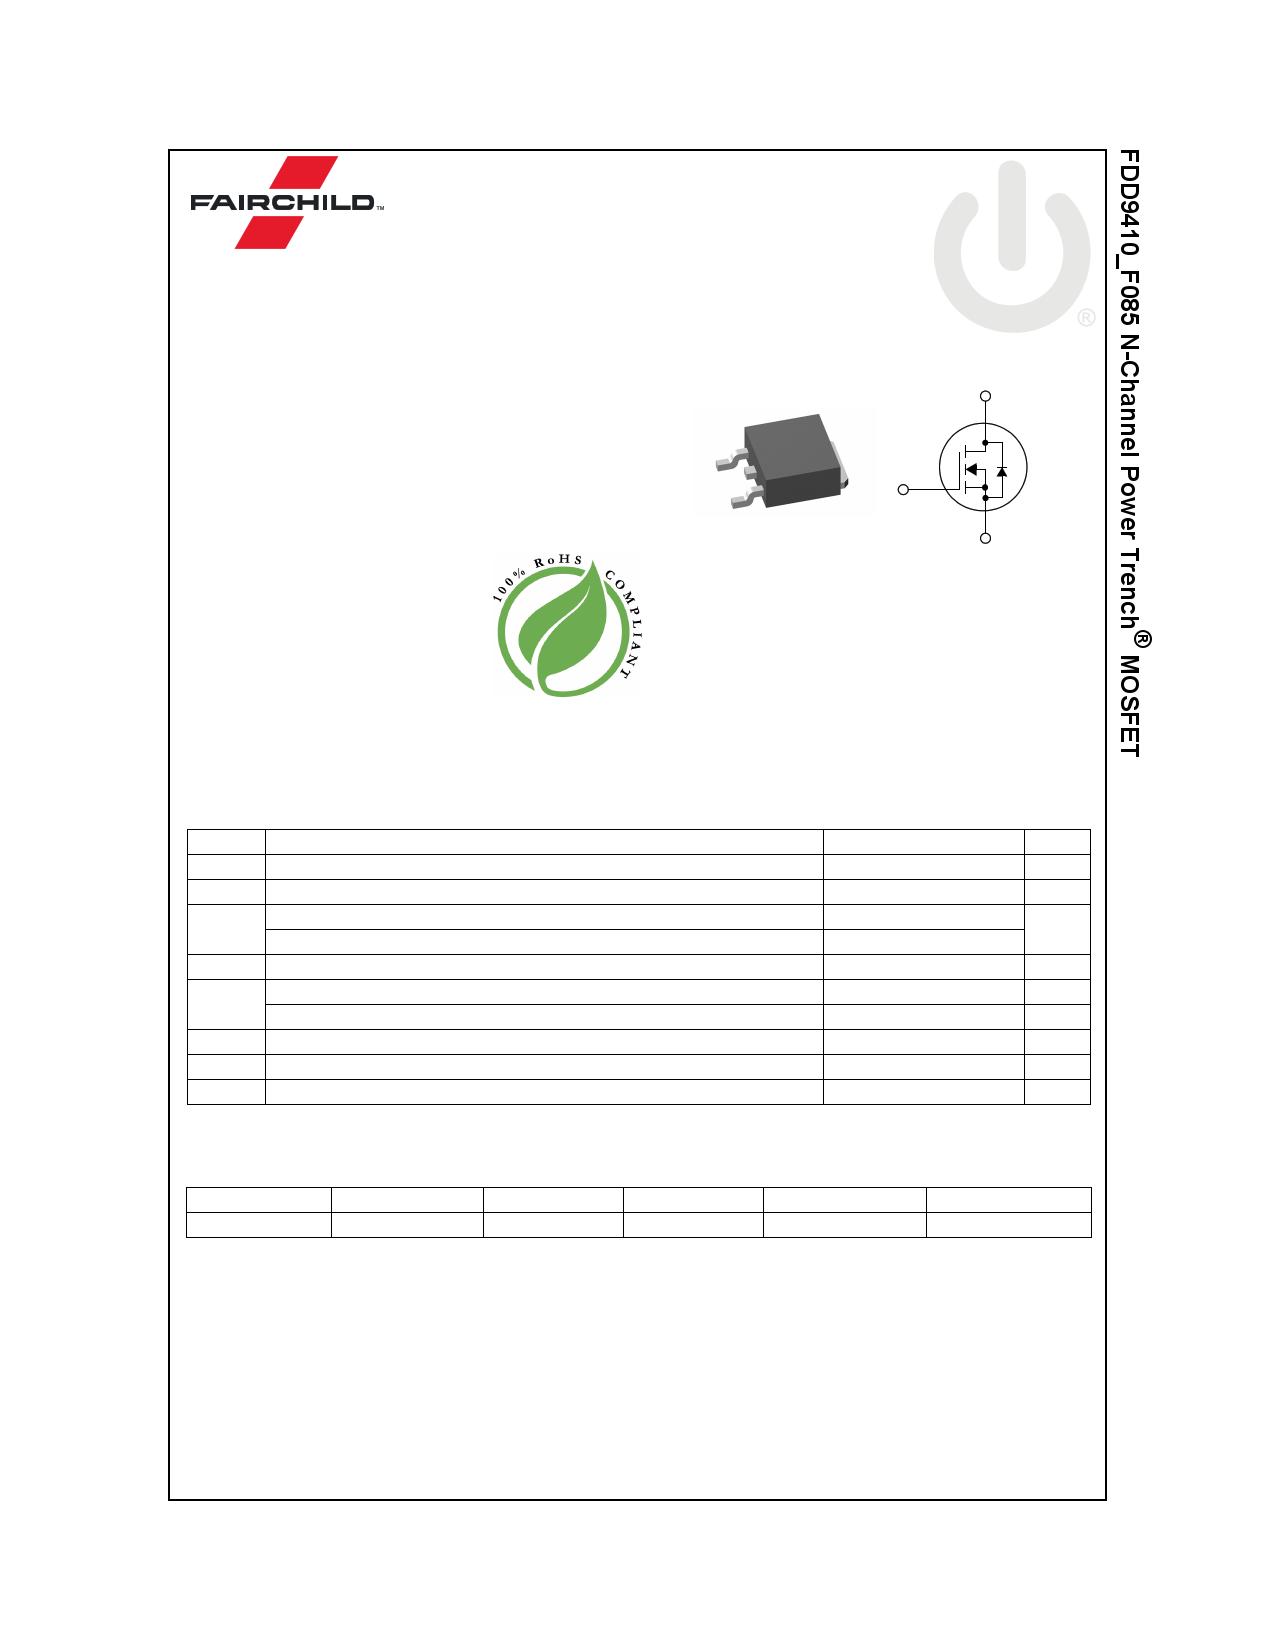 FDD9410_F085 데이터시트 및 FDD9410_F085 PDF